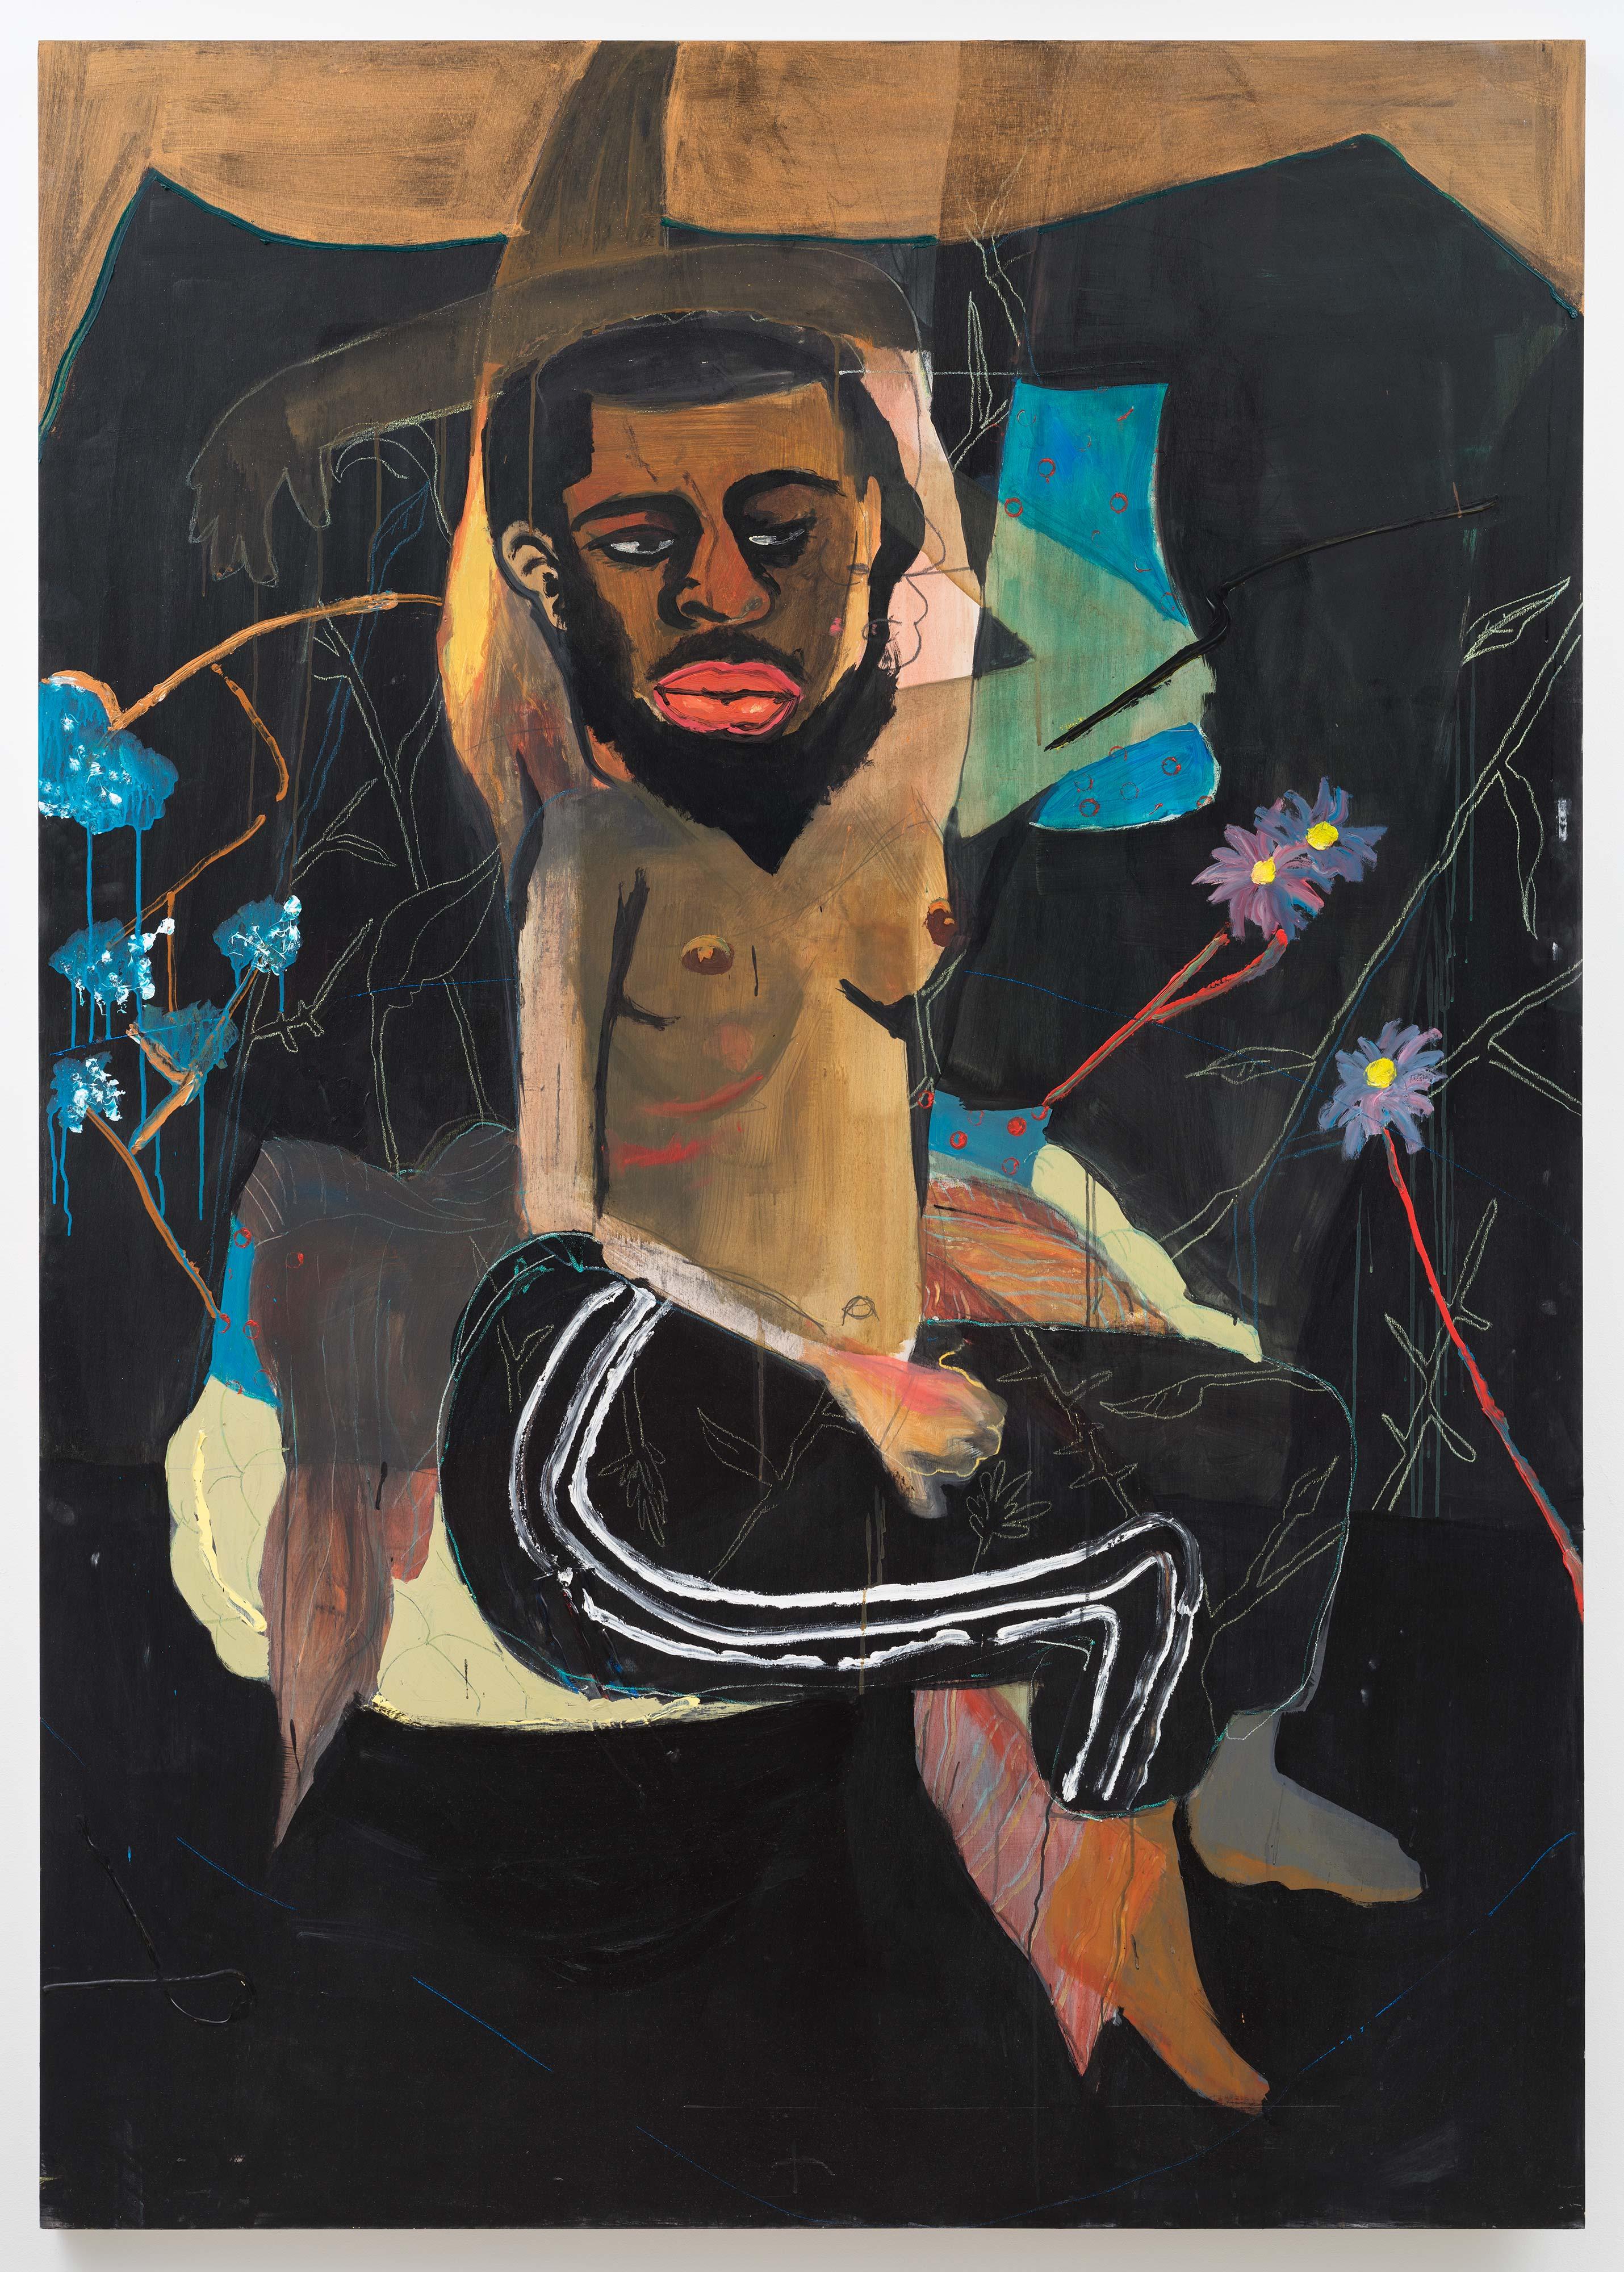 Jonathan Lyndon Chase<br>Hanged Man<br>2015<br>Acrylic on panel<br>84 x 60 in (213.4 x 152.4 cm)